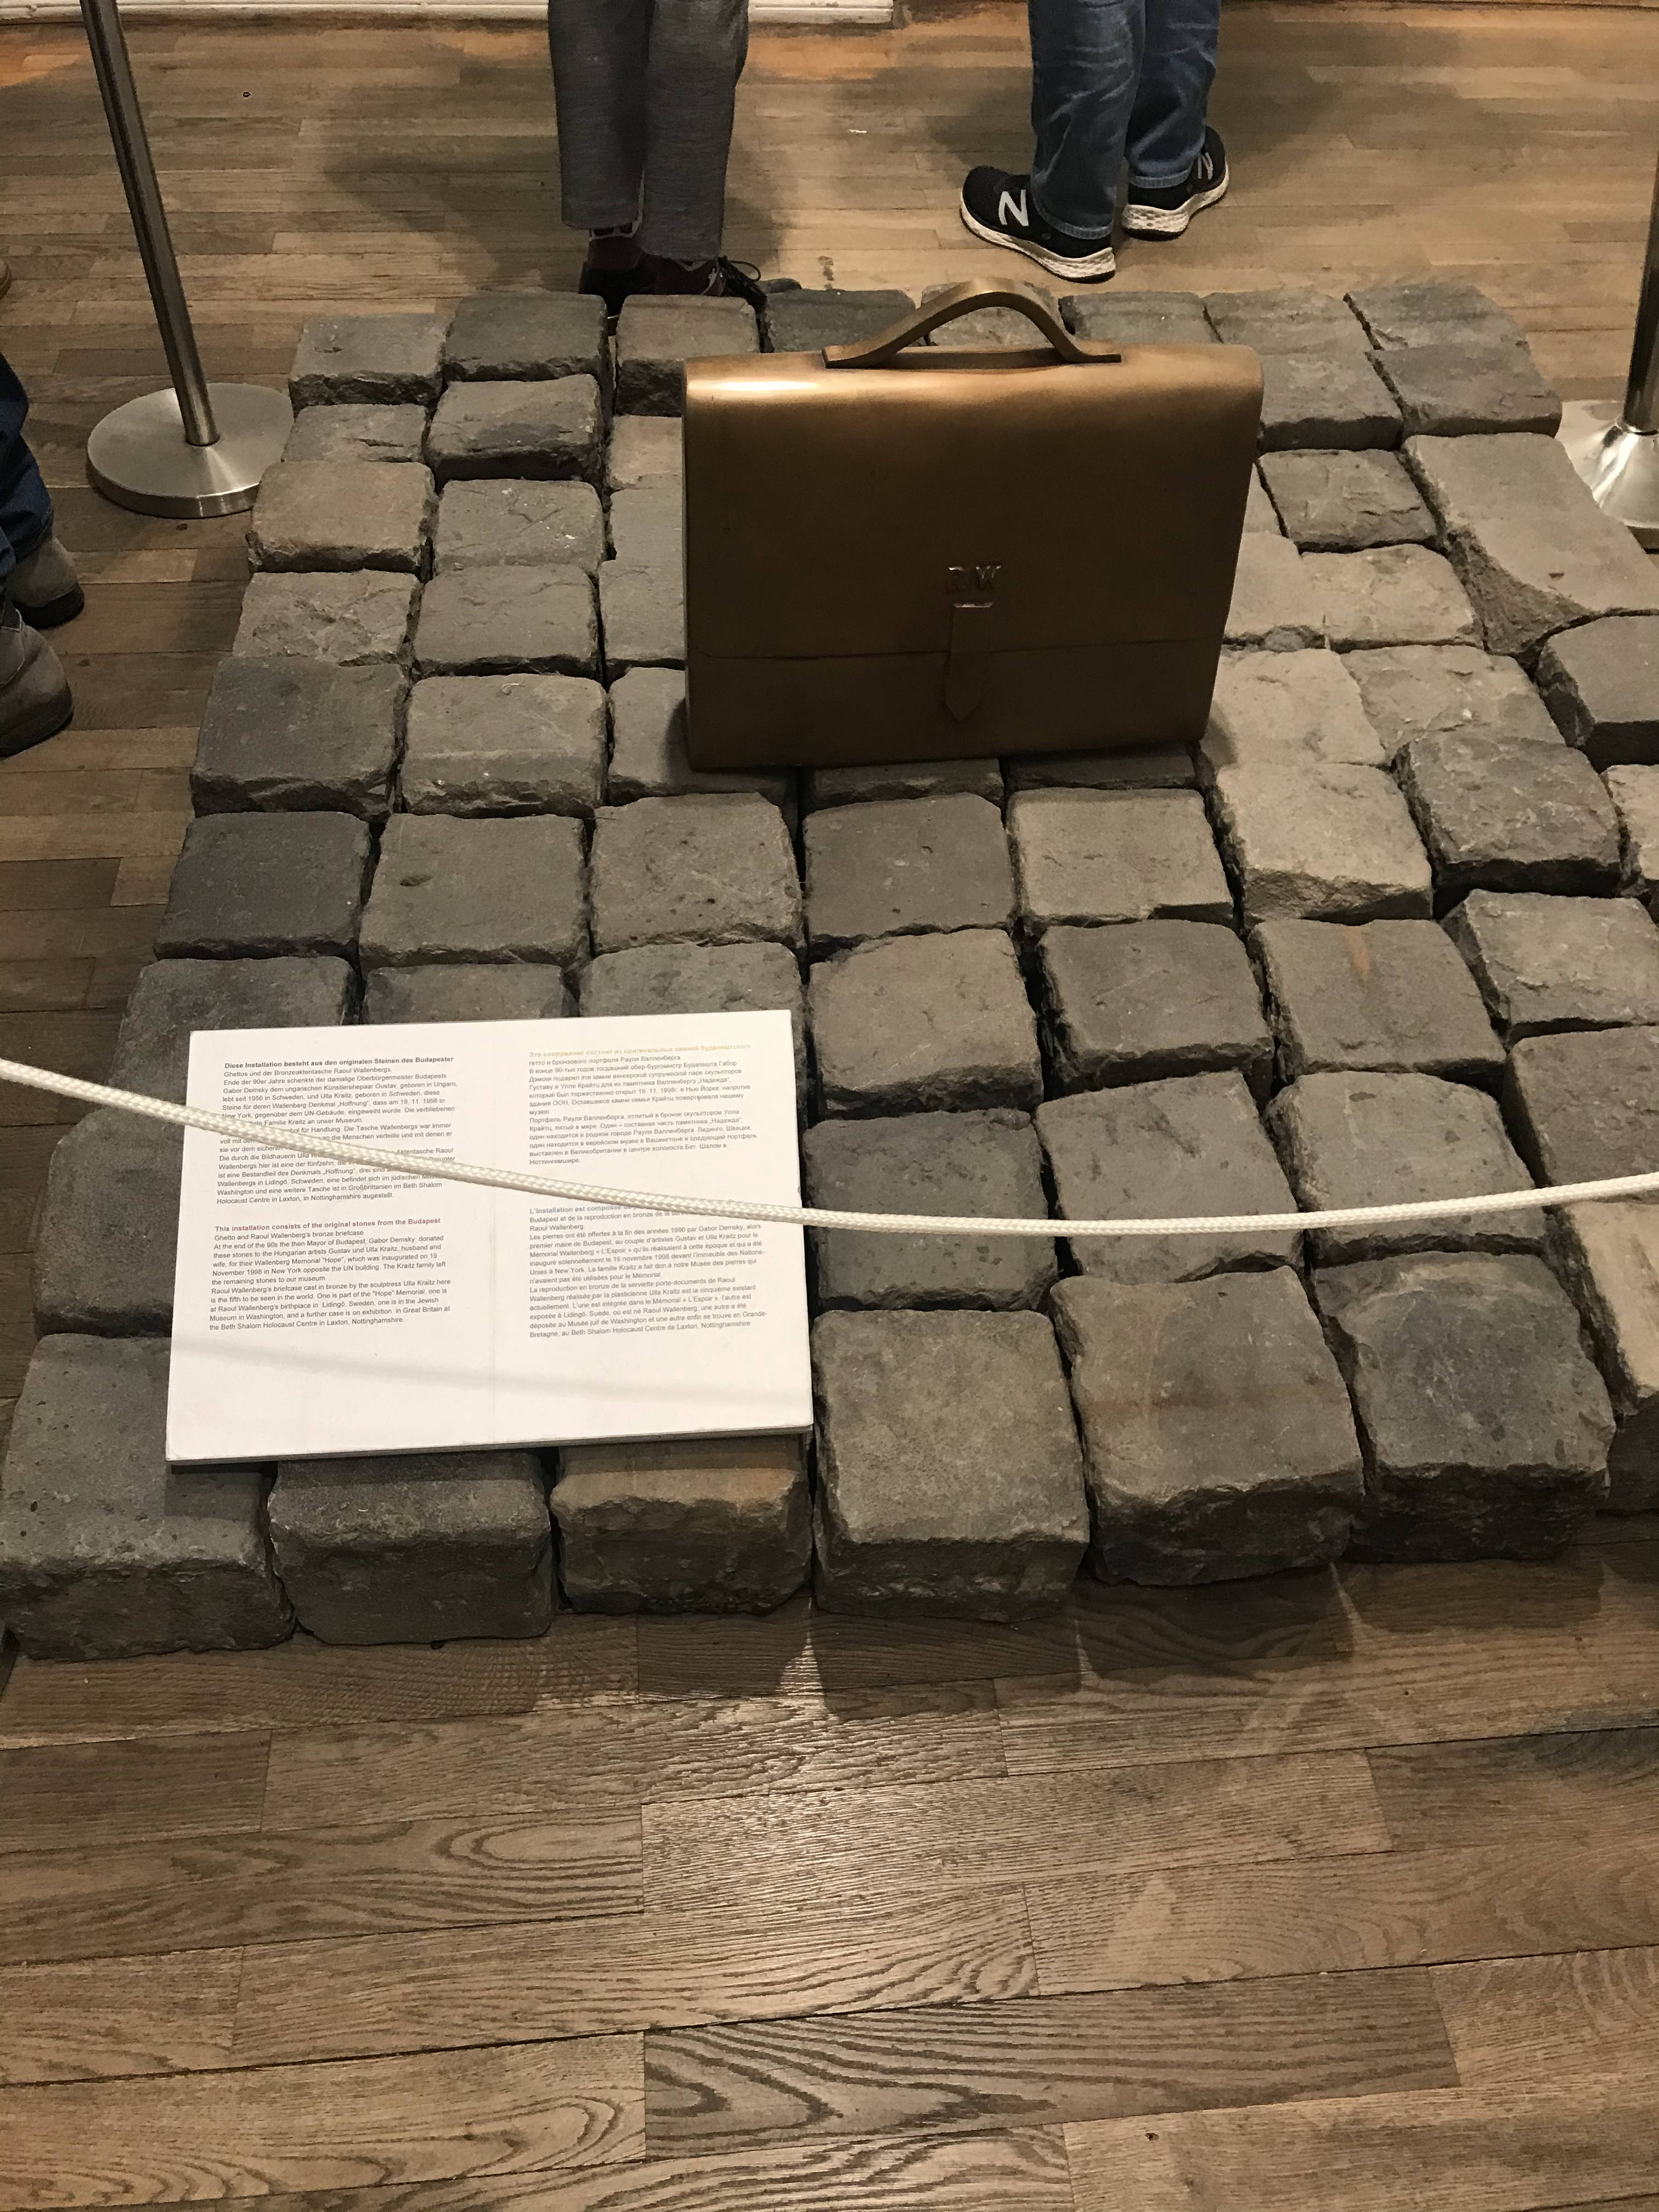 Raoul_Wallenberg_Installation